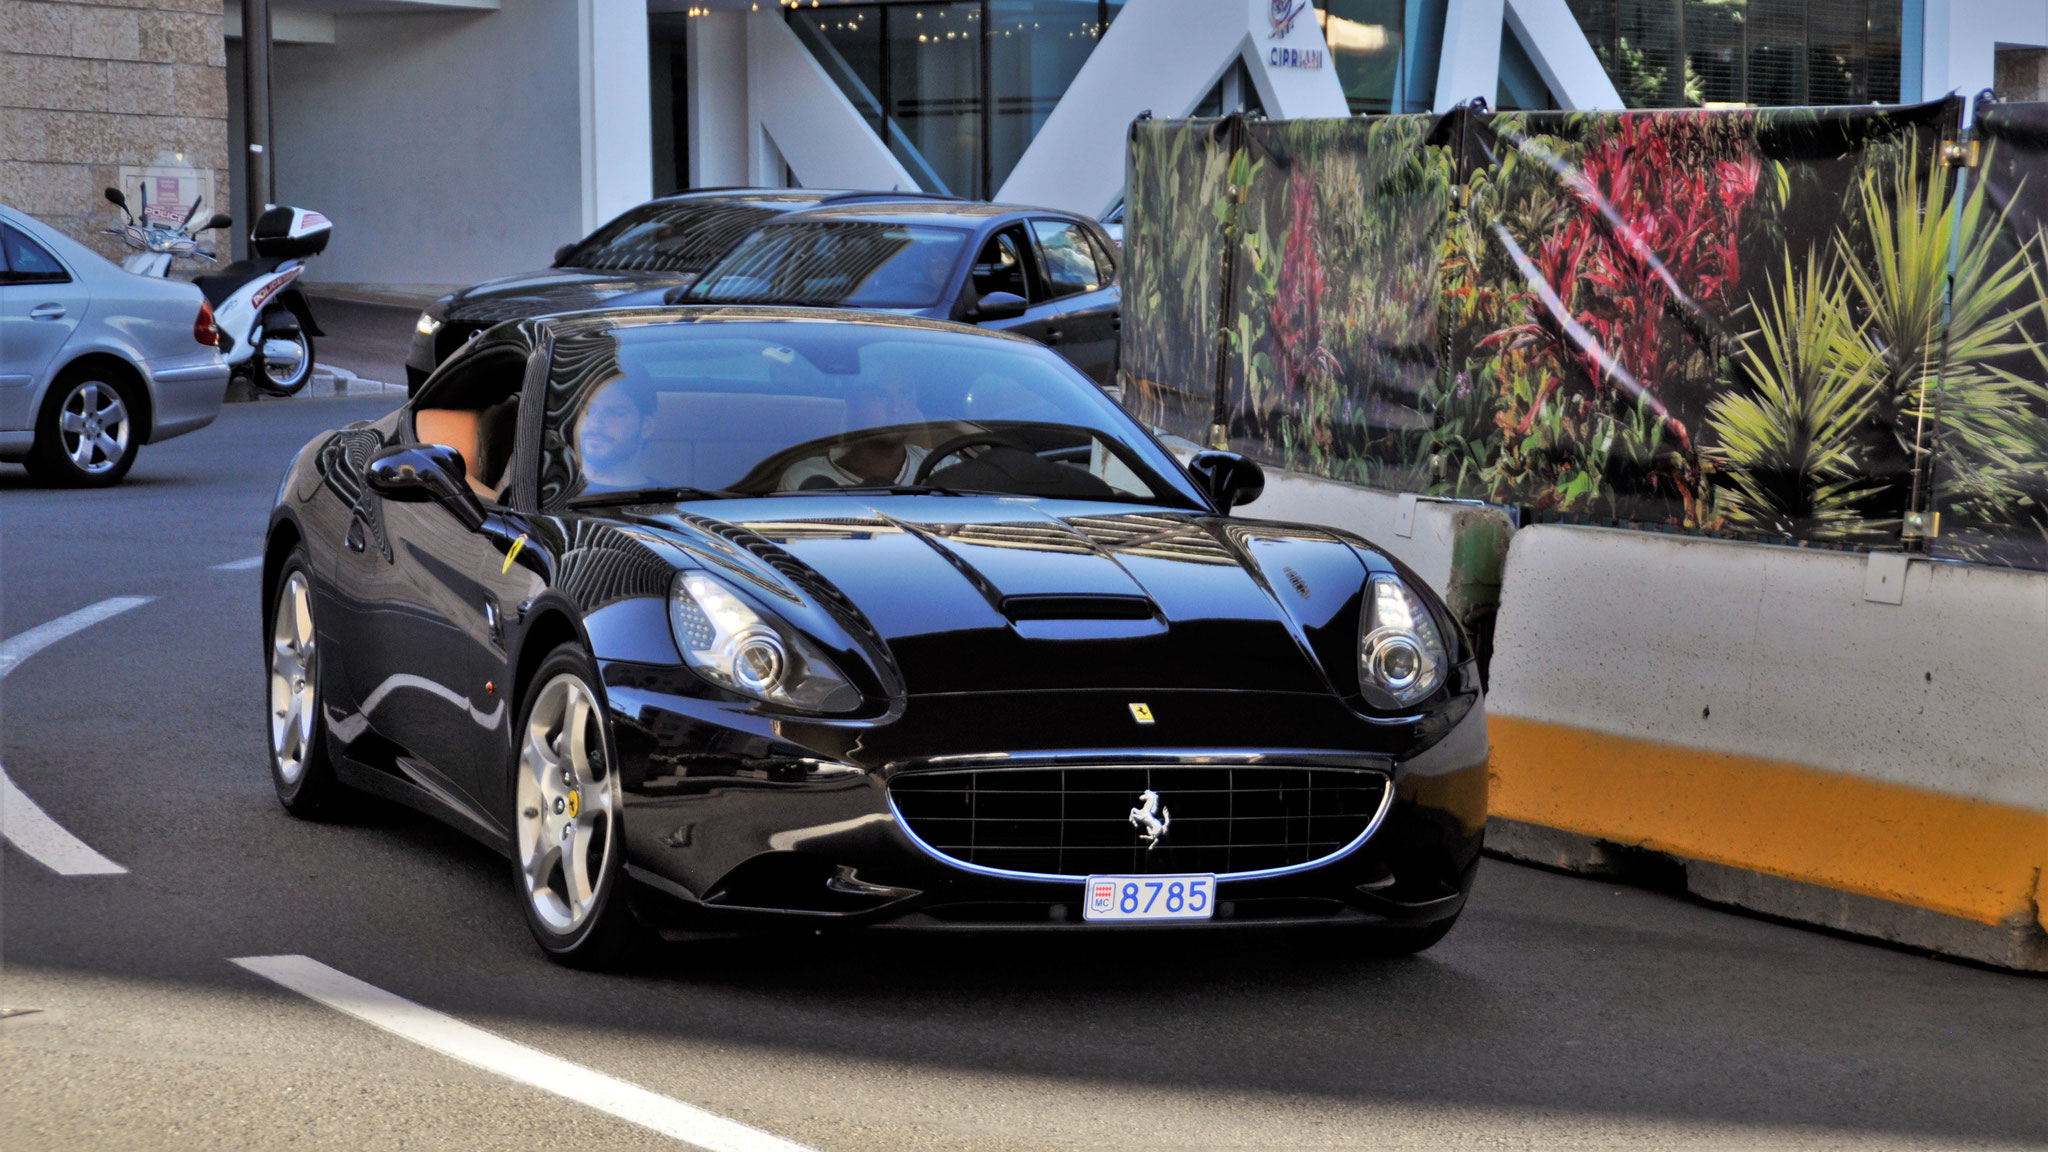 Ferrari California - 8785 (MC)